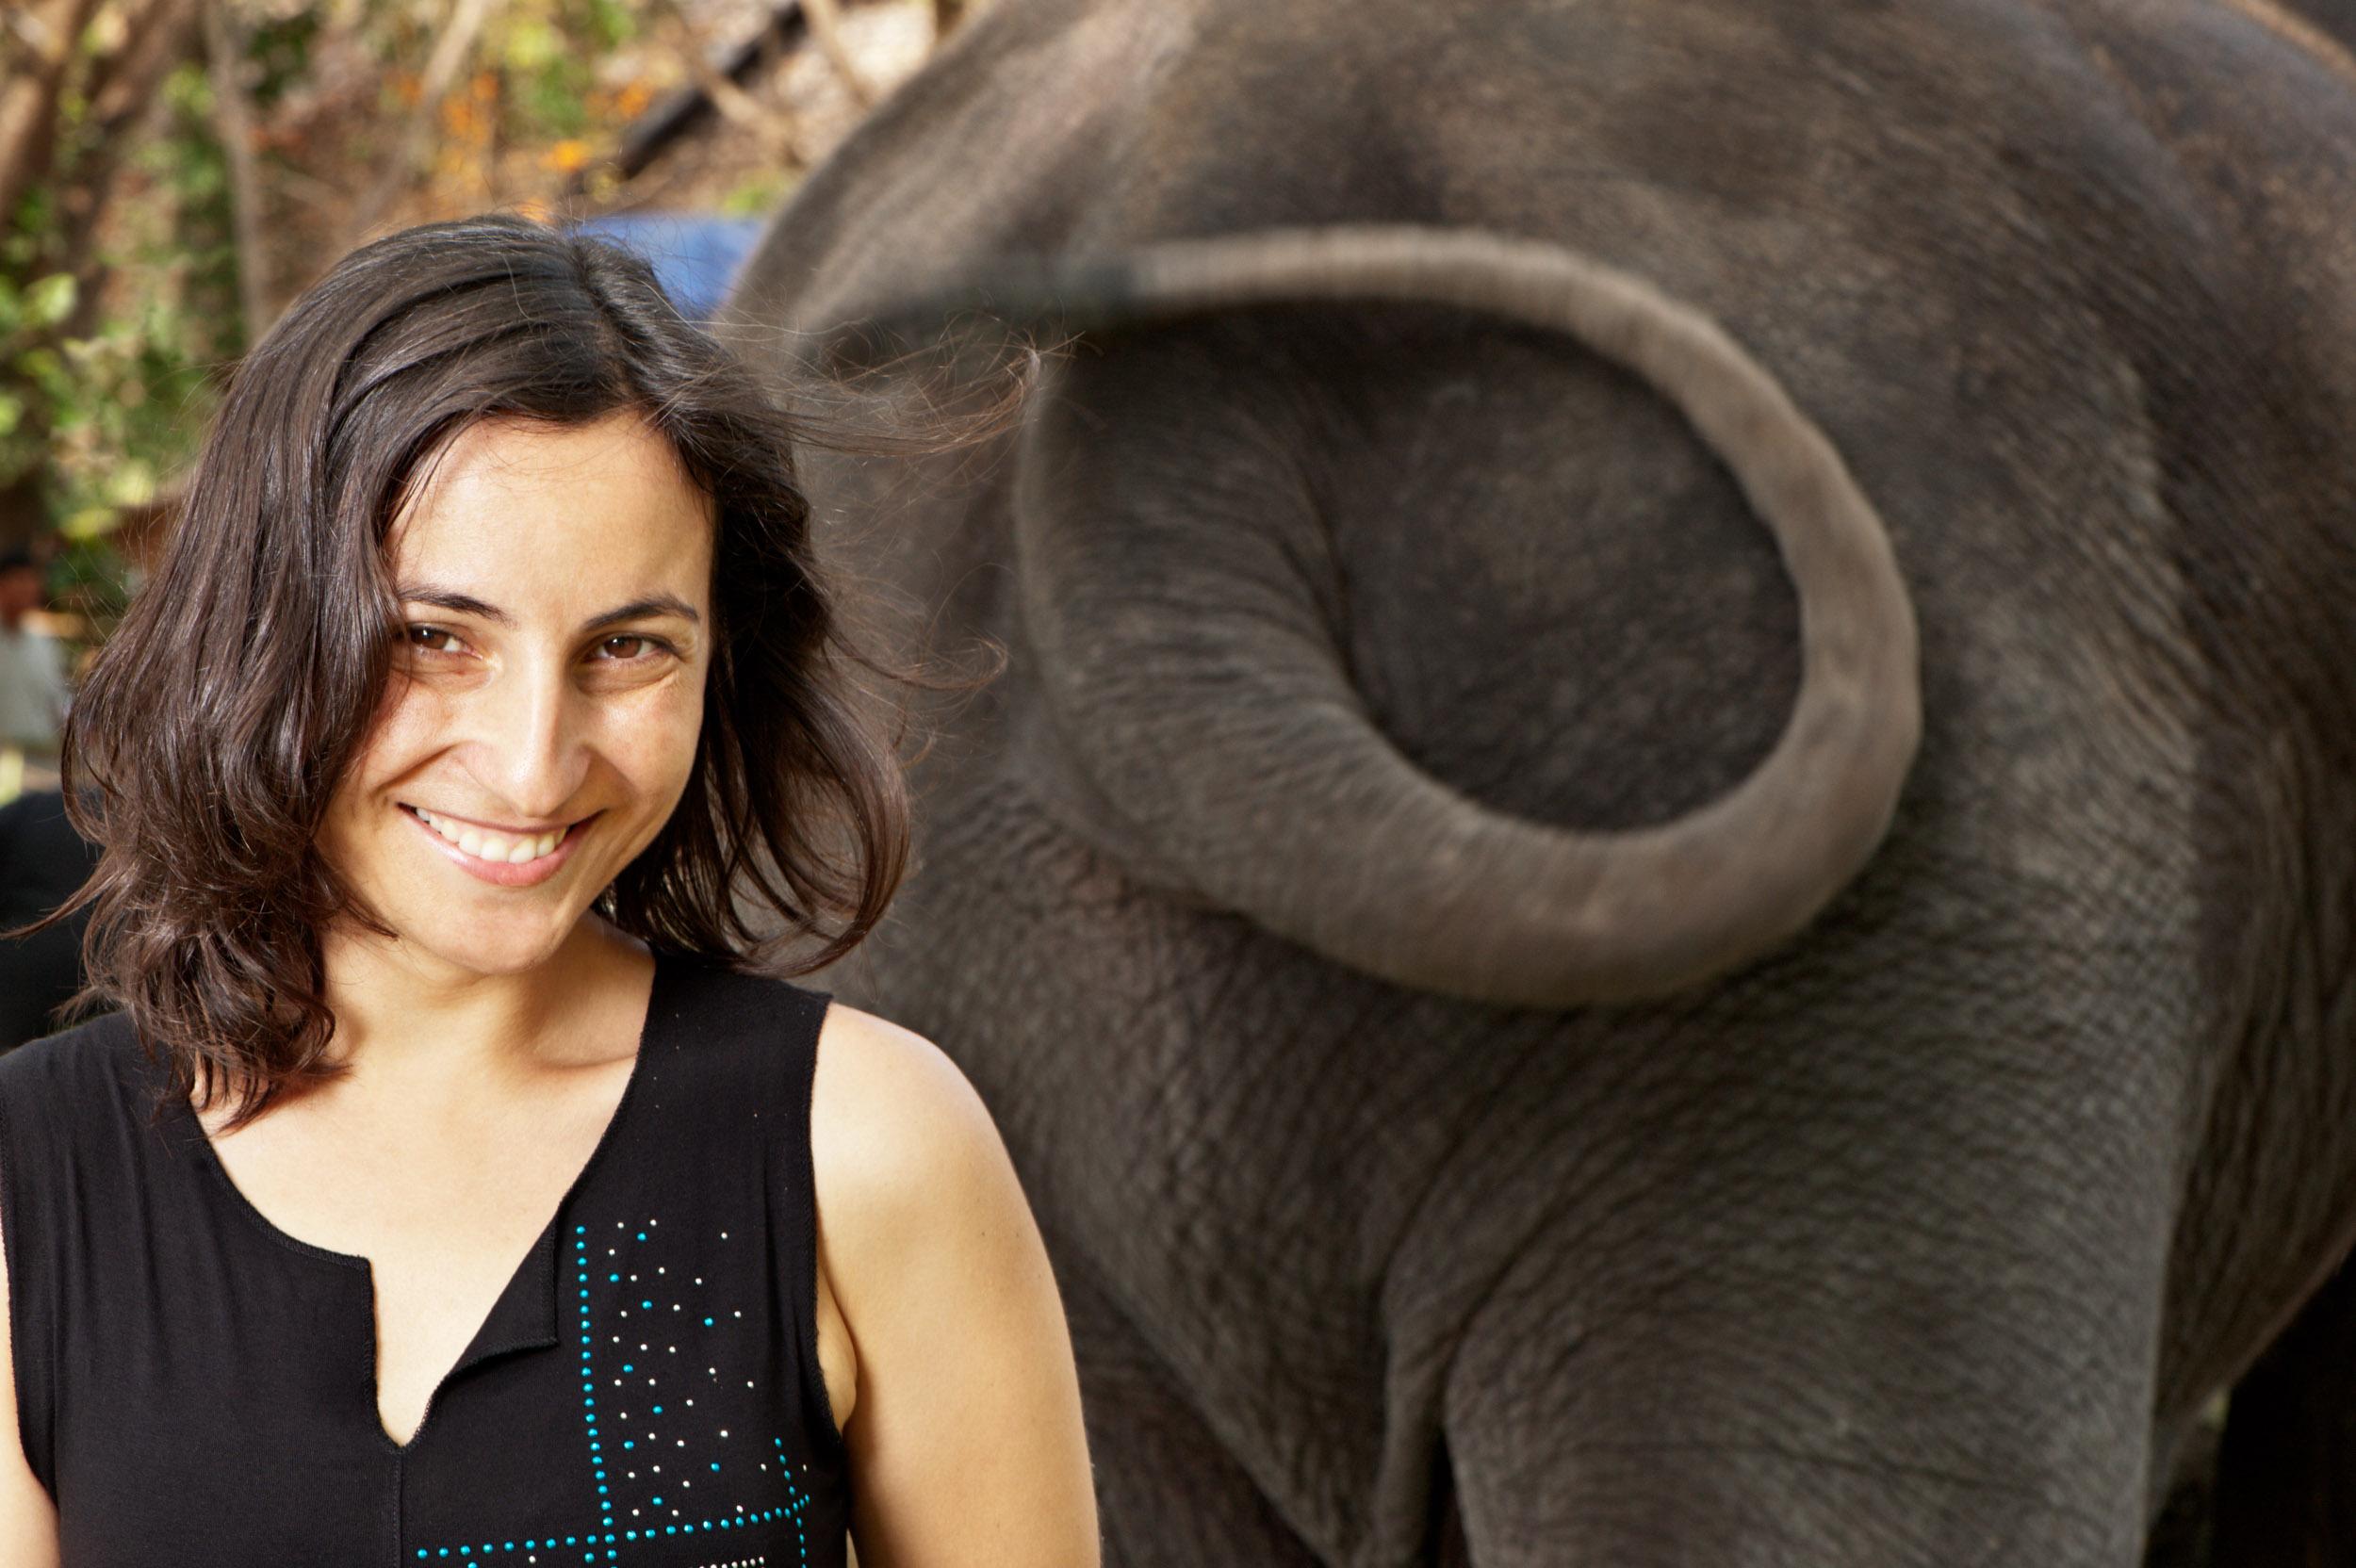 portrait photography idea a woman with an elephant